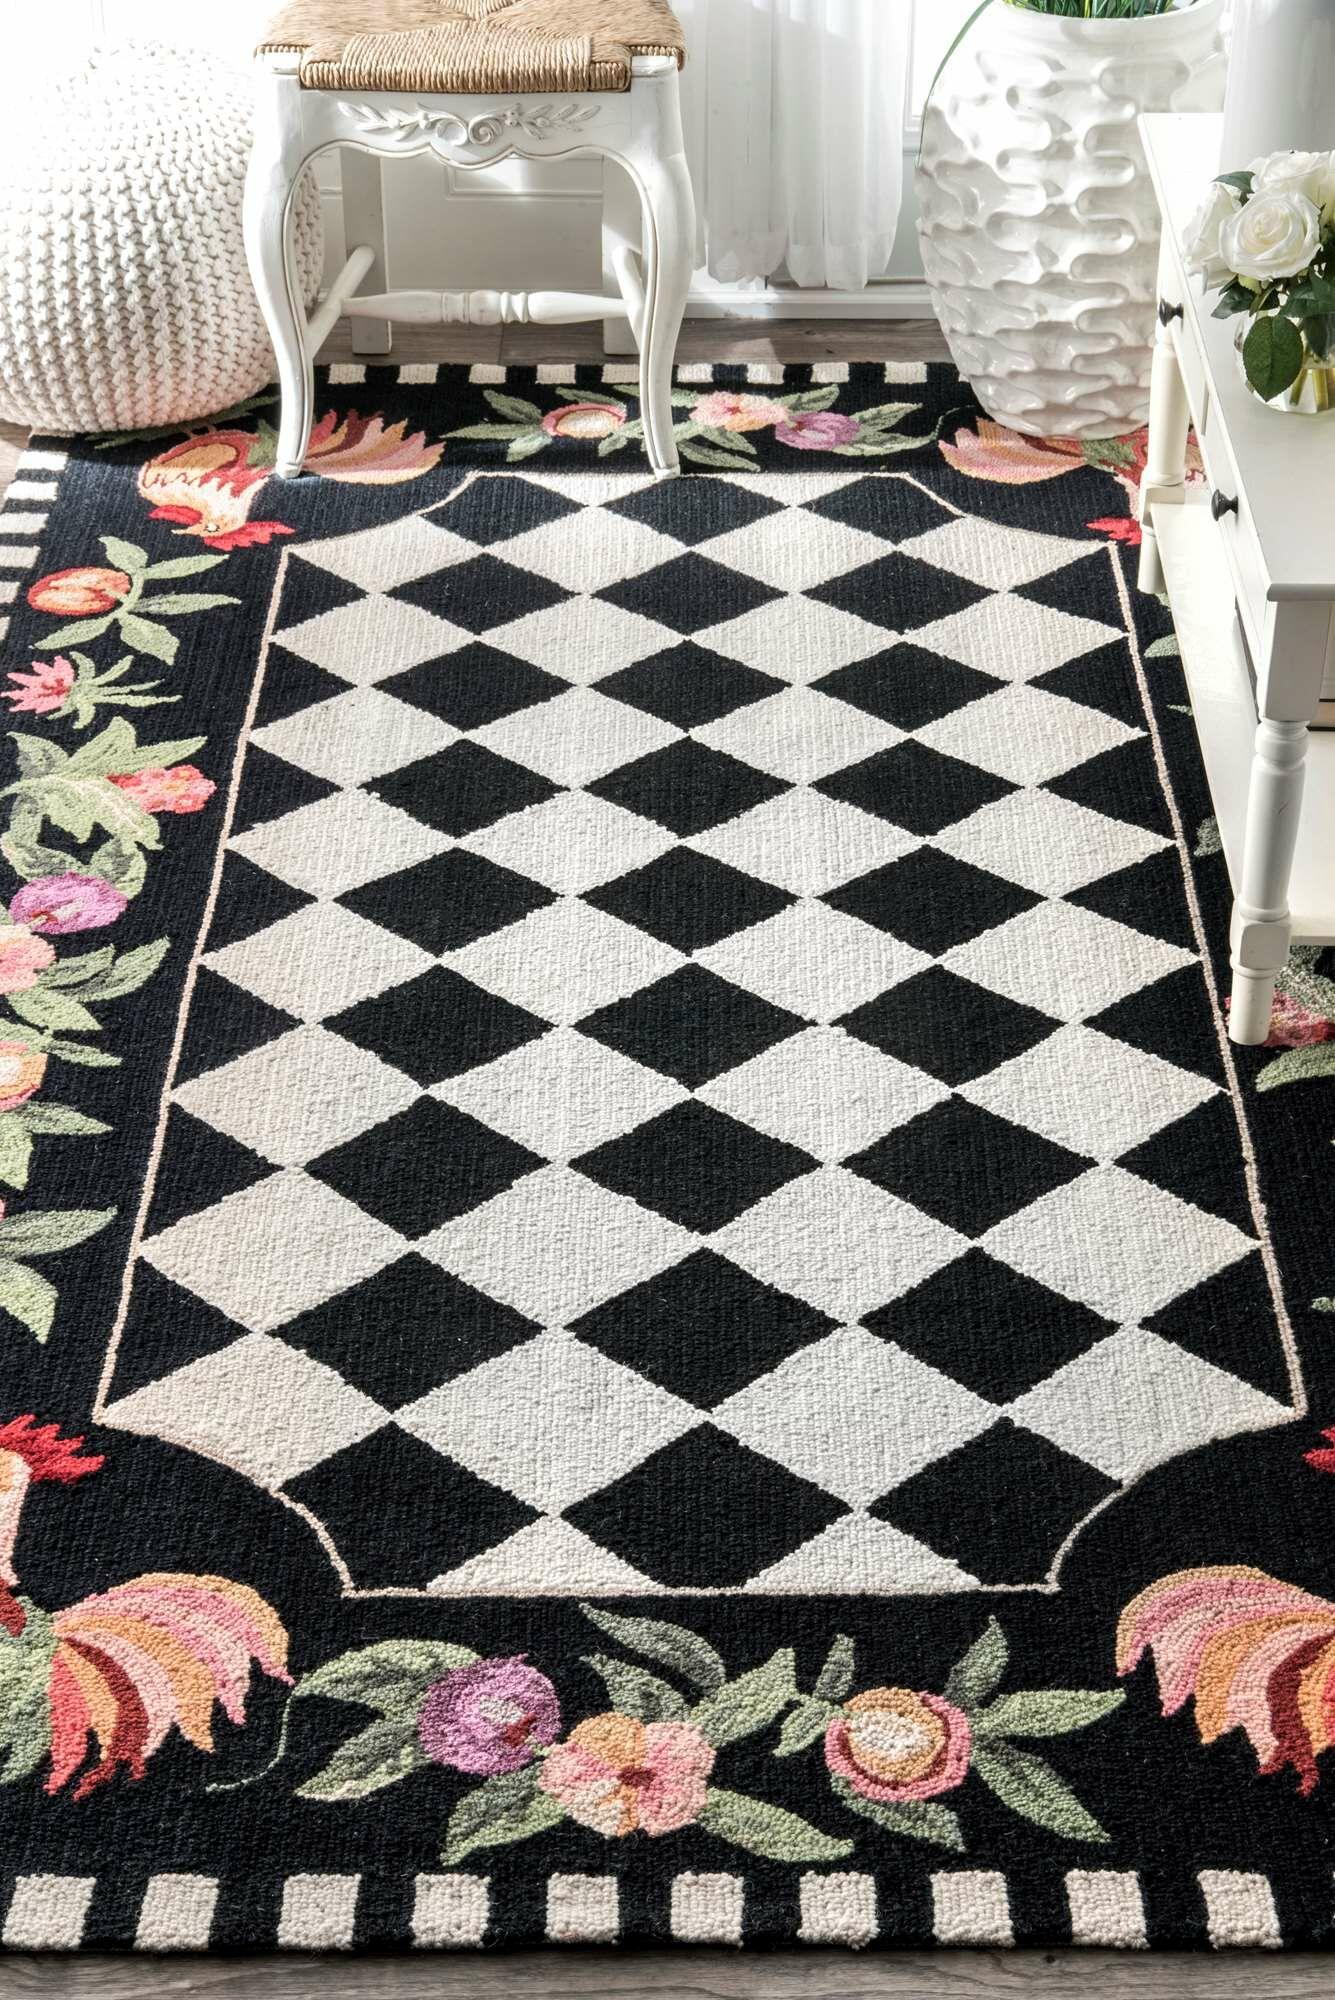 Bacourt Black Novelty Area Rug Rug Size: Rectangle 3'6